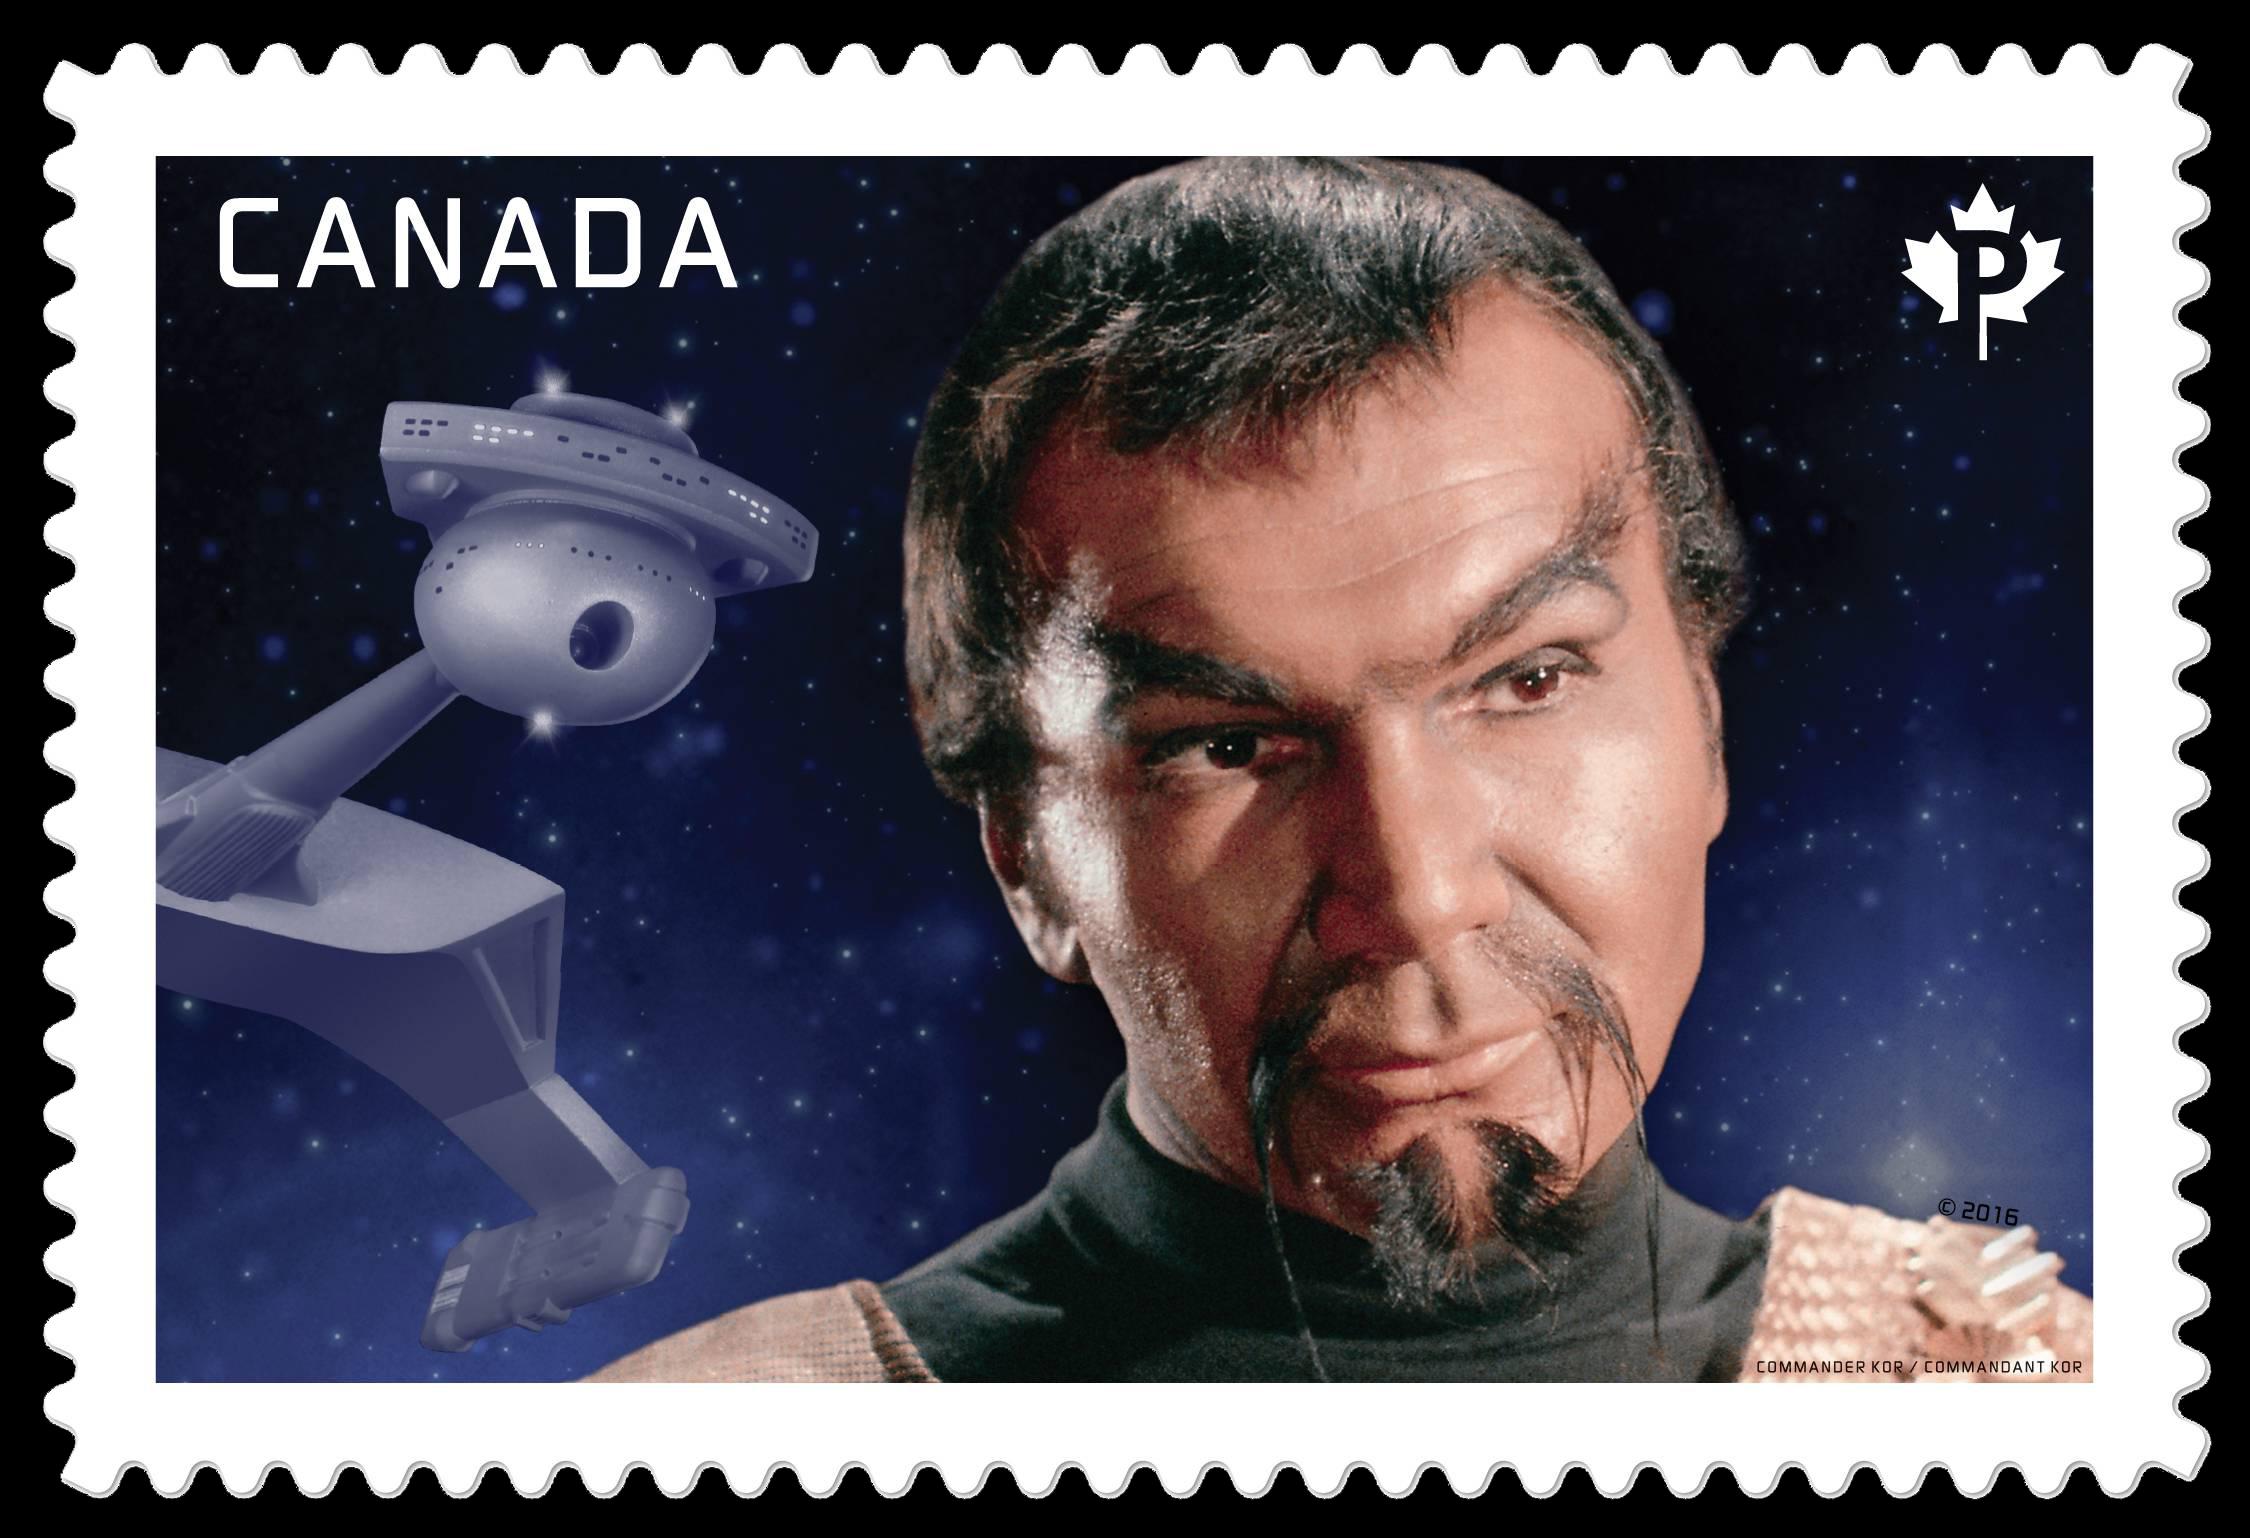 Commander Kor - Star Trek Canada Postage Stamp   Star Trek